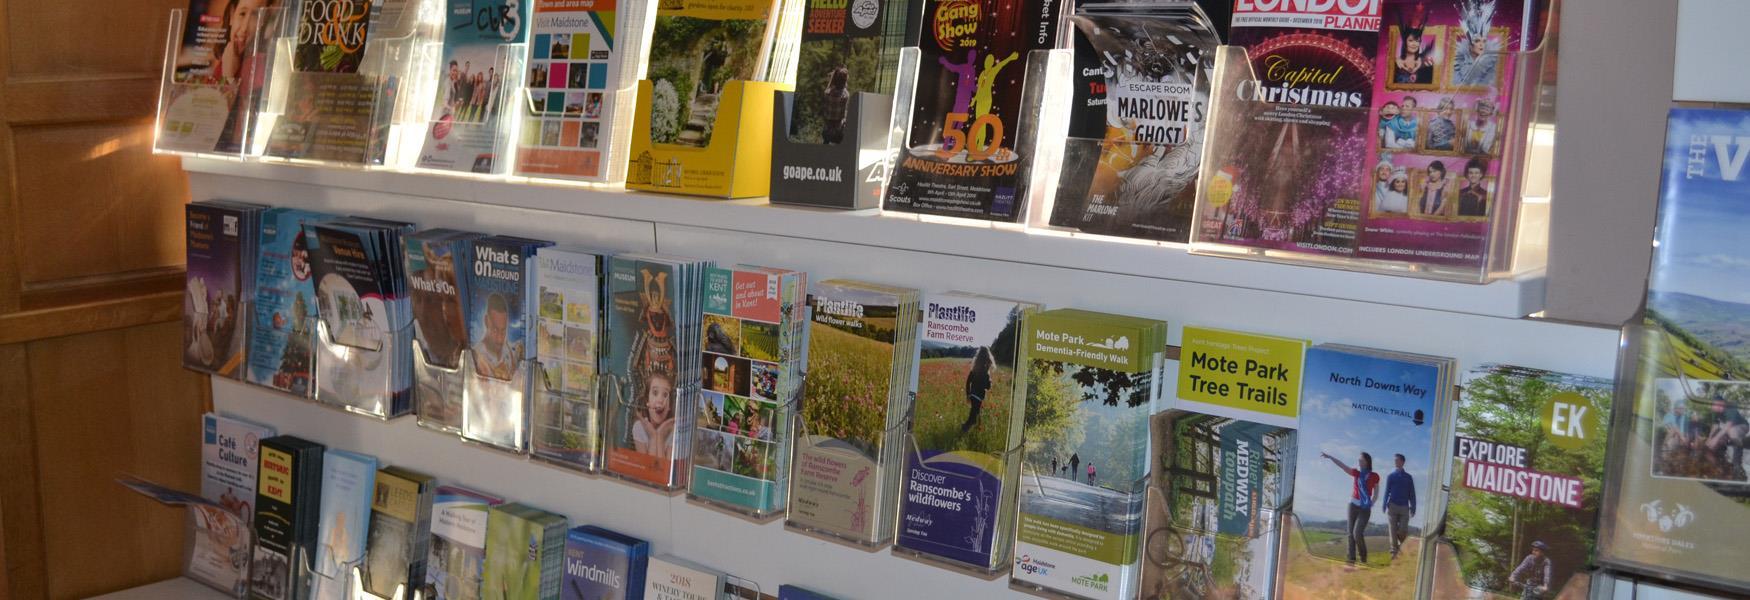 Leaflets at the Tourist Information Centre